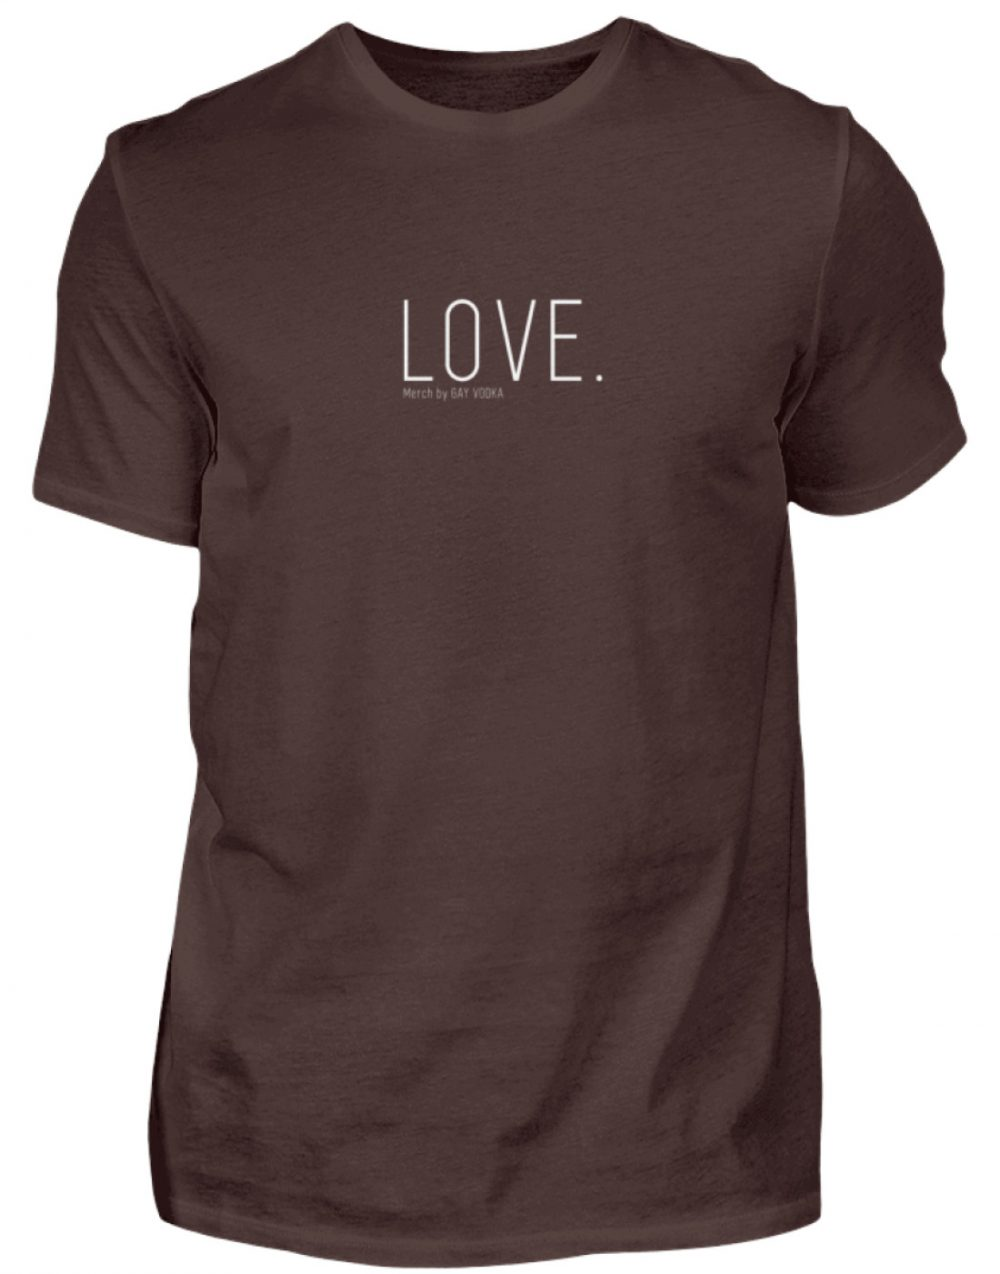 LOVE. - Herren Shirt-1074